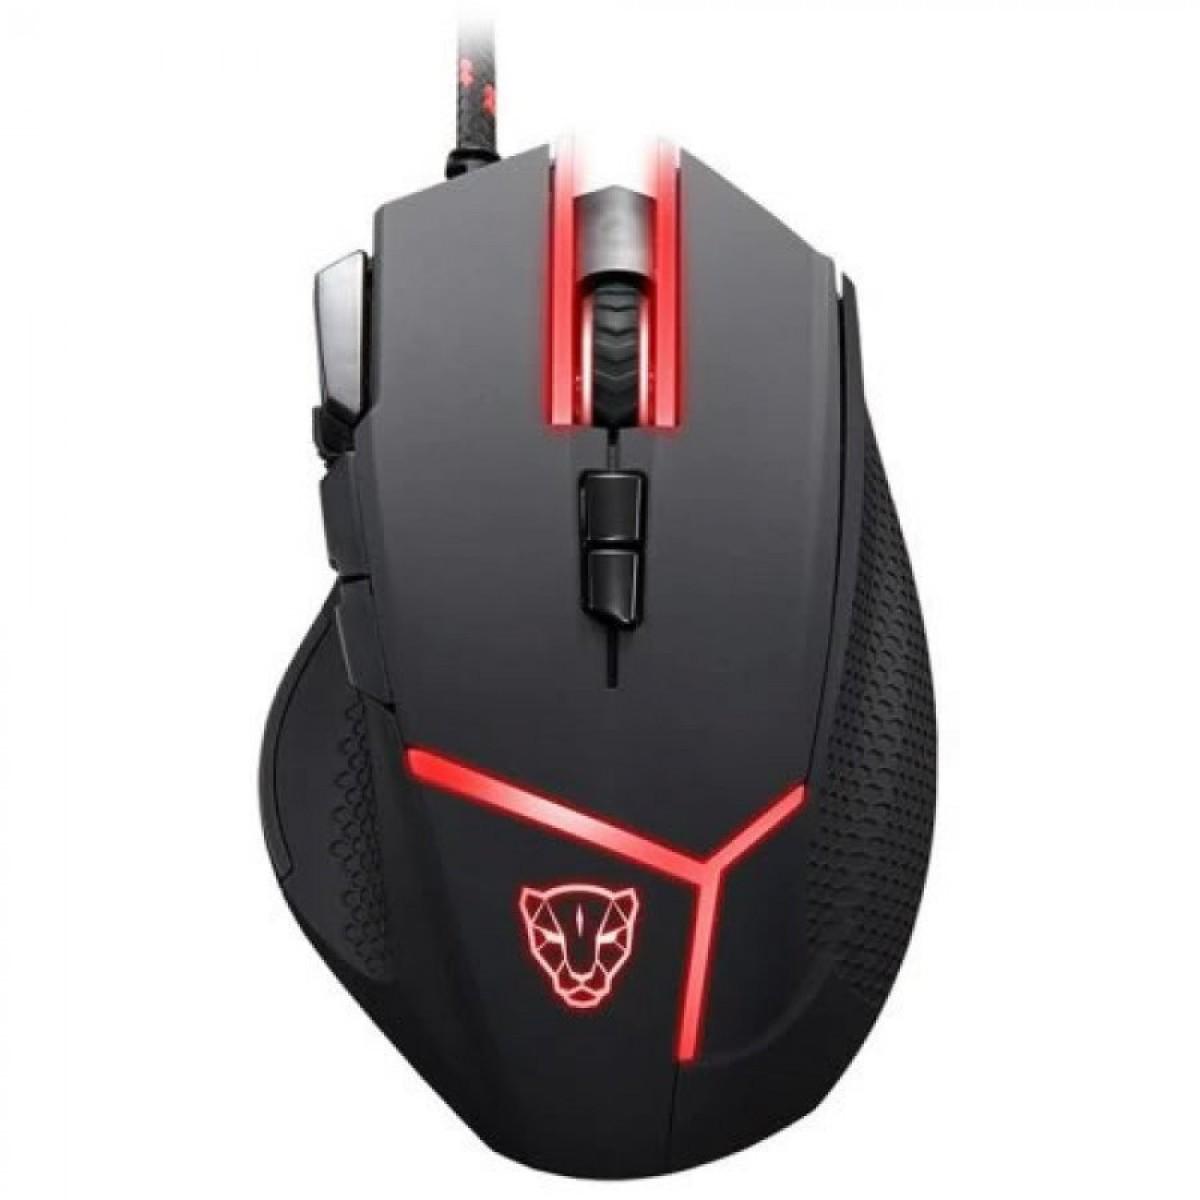 Mouse Gamer Motospeed V18 Hero Leopard, 4000 DPI, RGB, 9 Botões, Black, FMSMS0059PTO